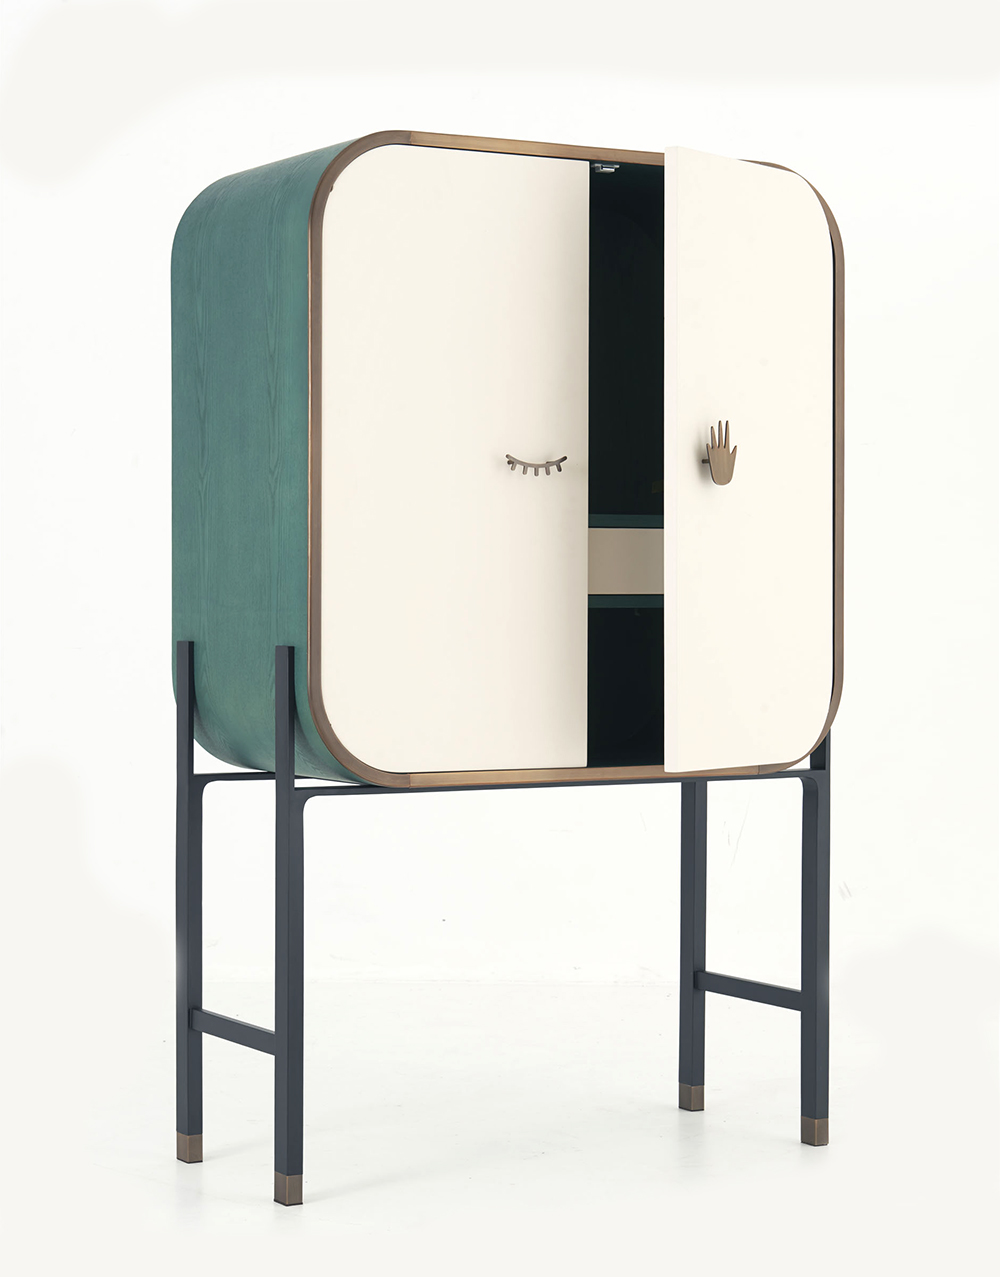 BLINK Furniture Collection by Yabu Pushelburg